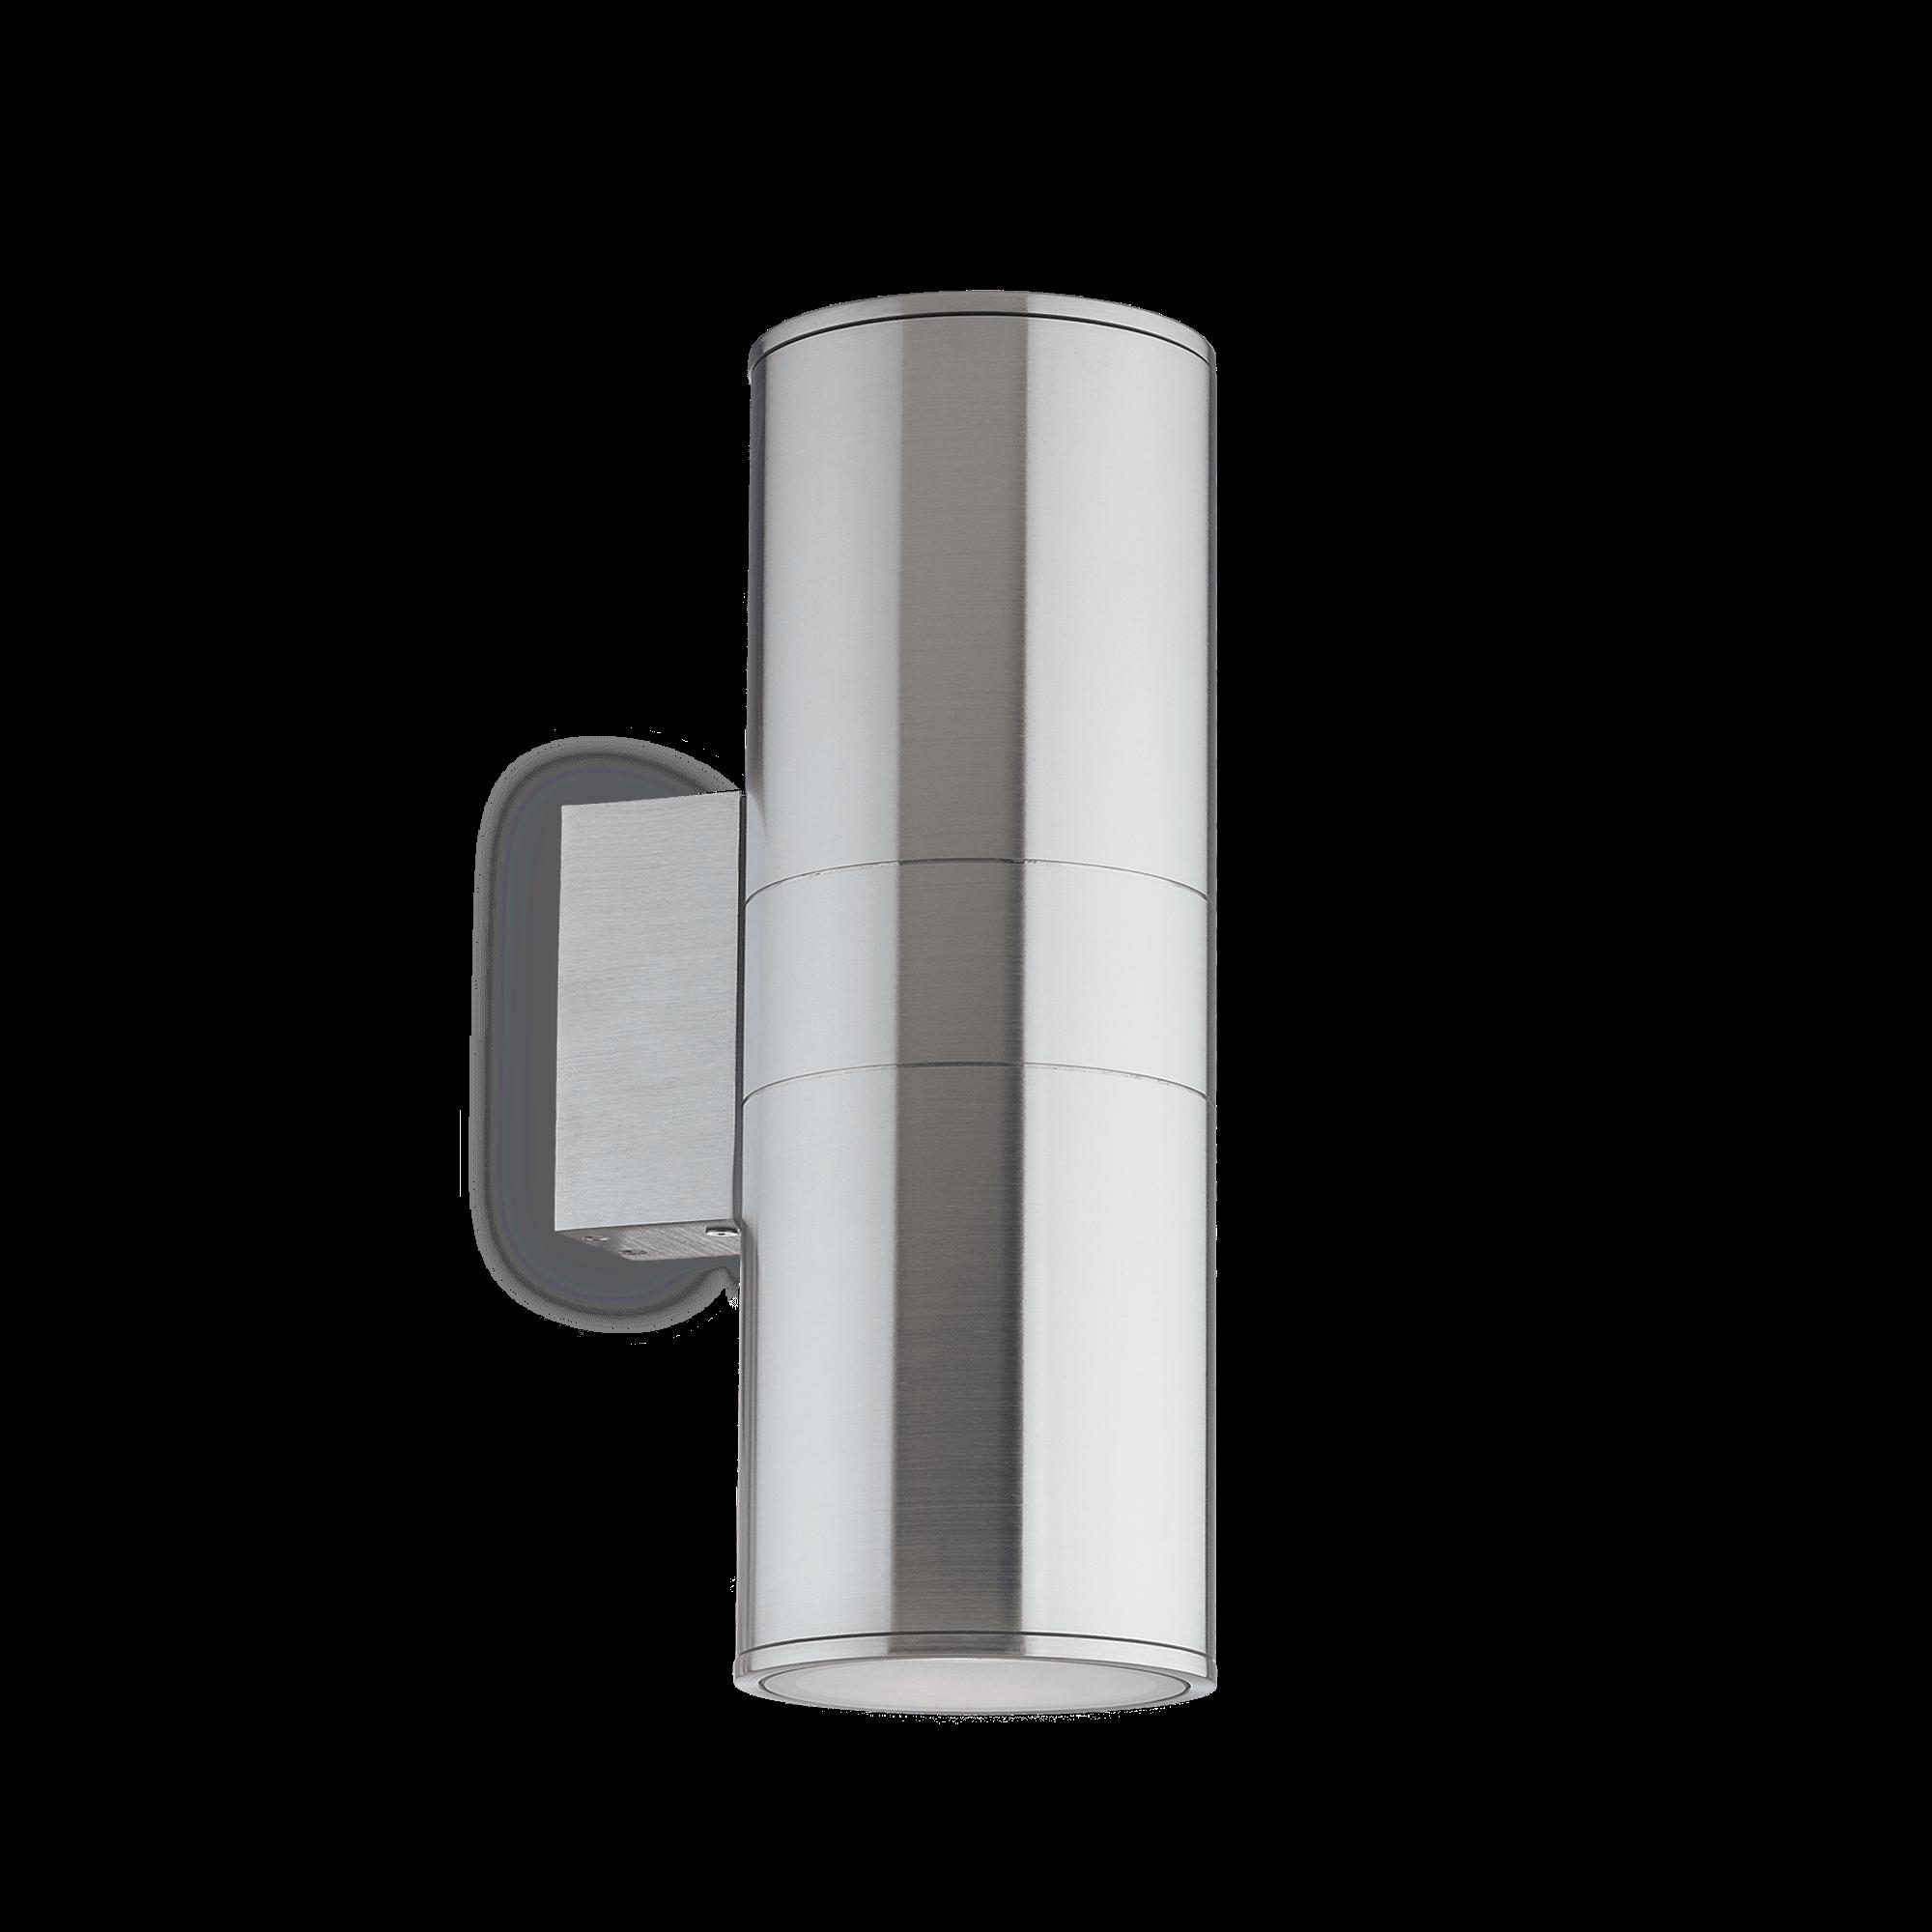 Ideal Lux 033020 Gun AP2 Big Alluminio kültéri falilámpa